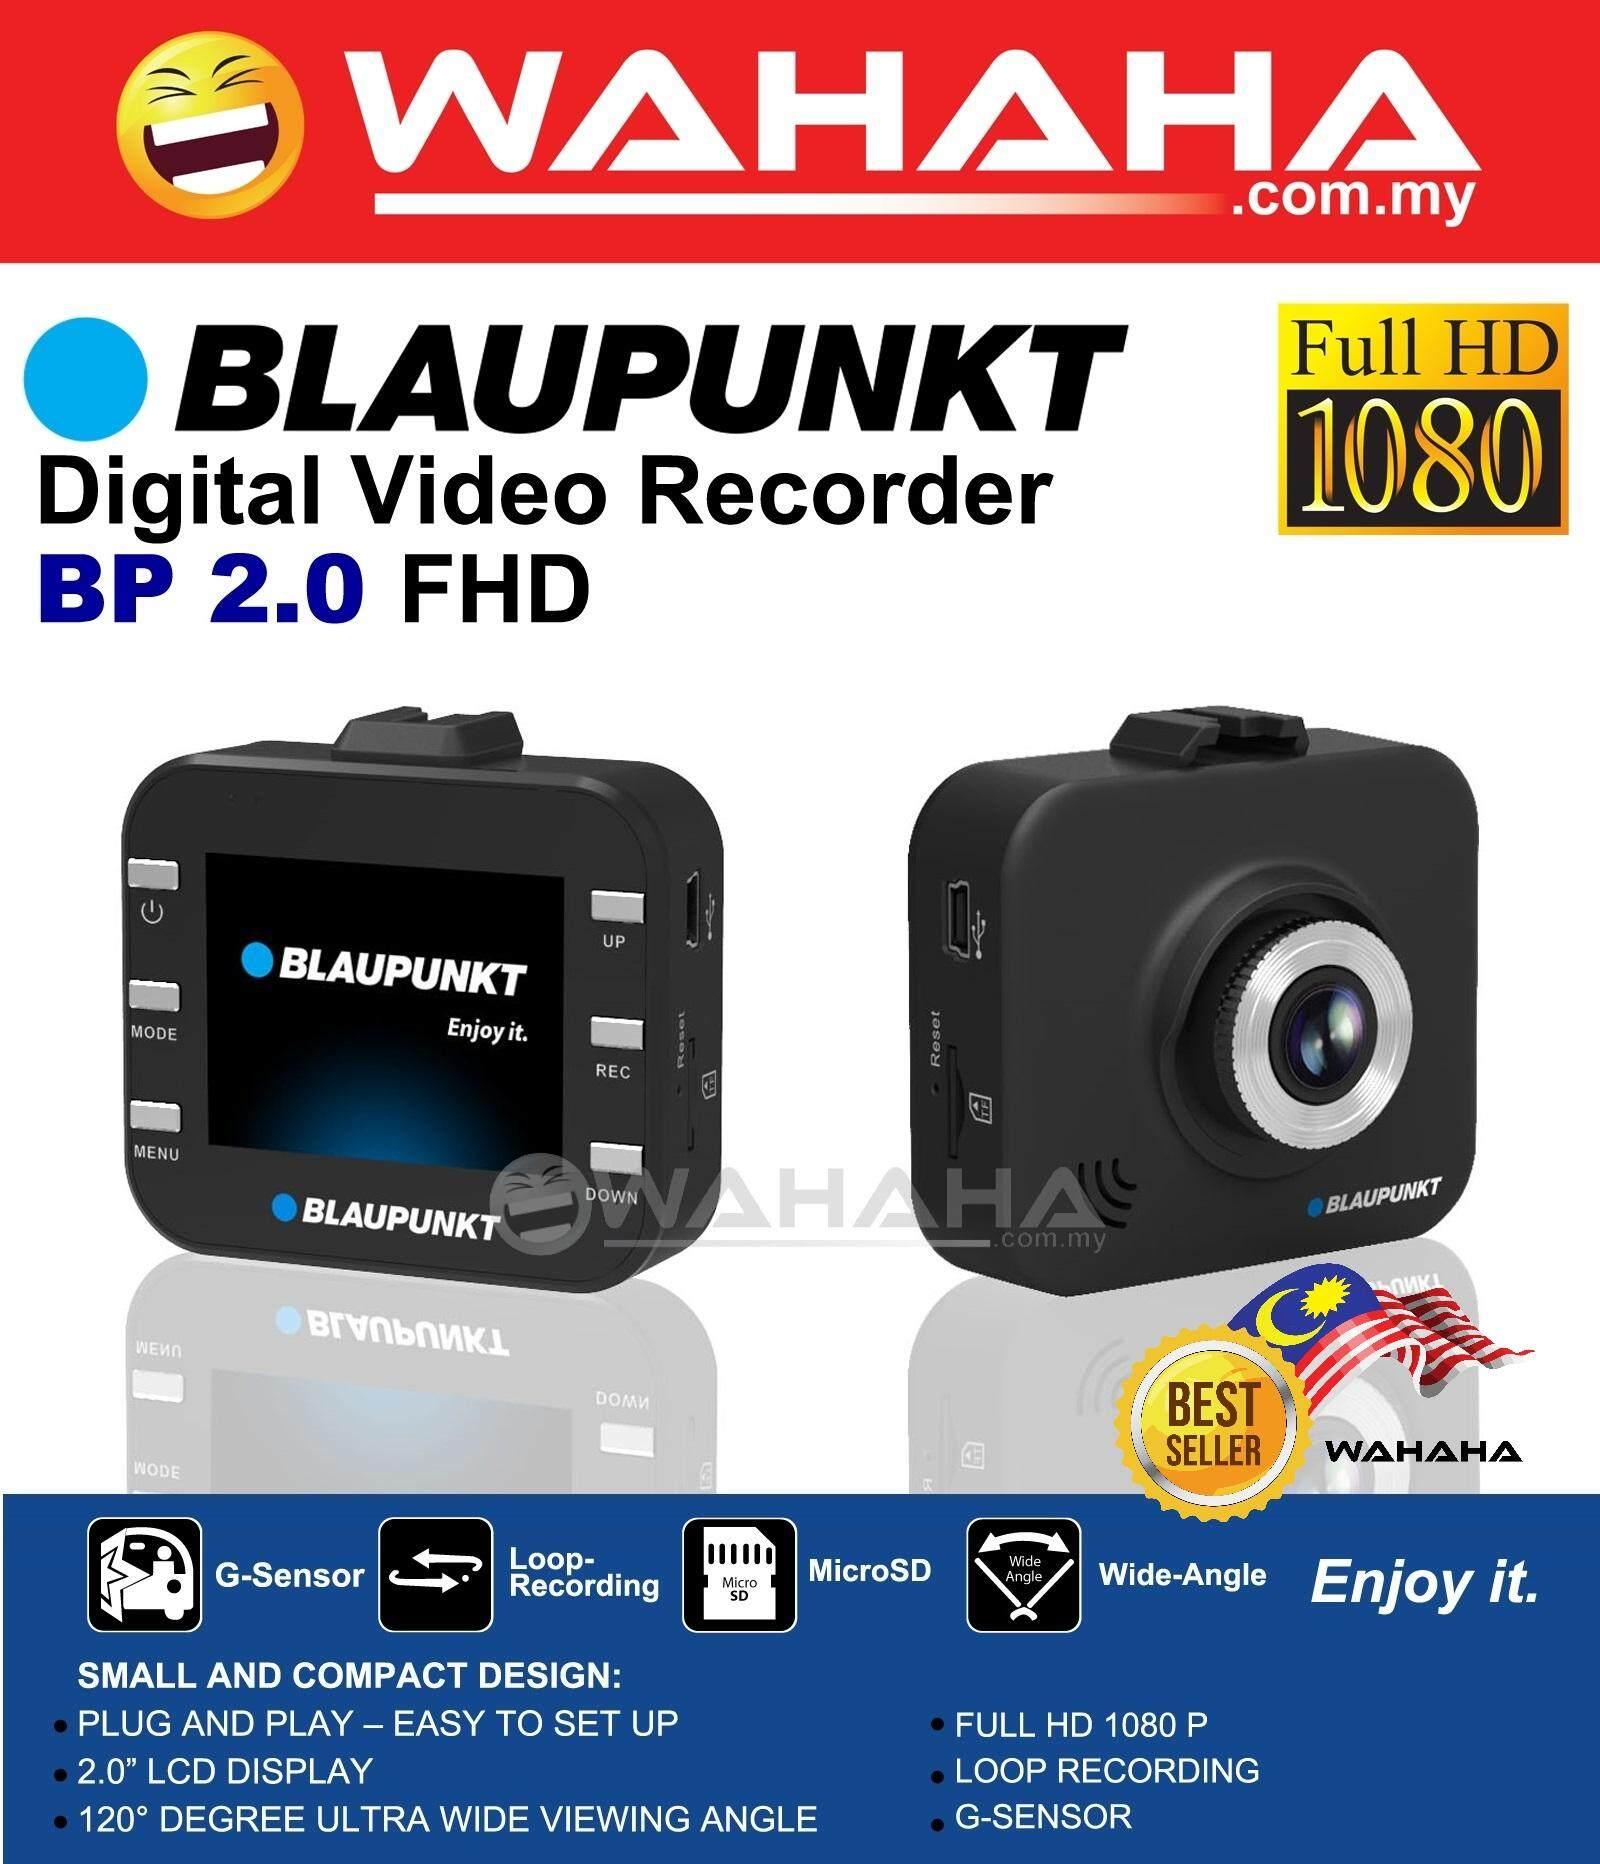 Blaupunkt Vehicle Backup Cameras price in Malaysia - Best Blaupunkt